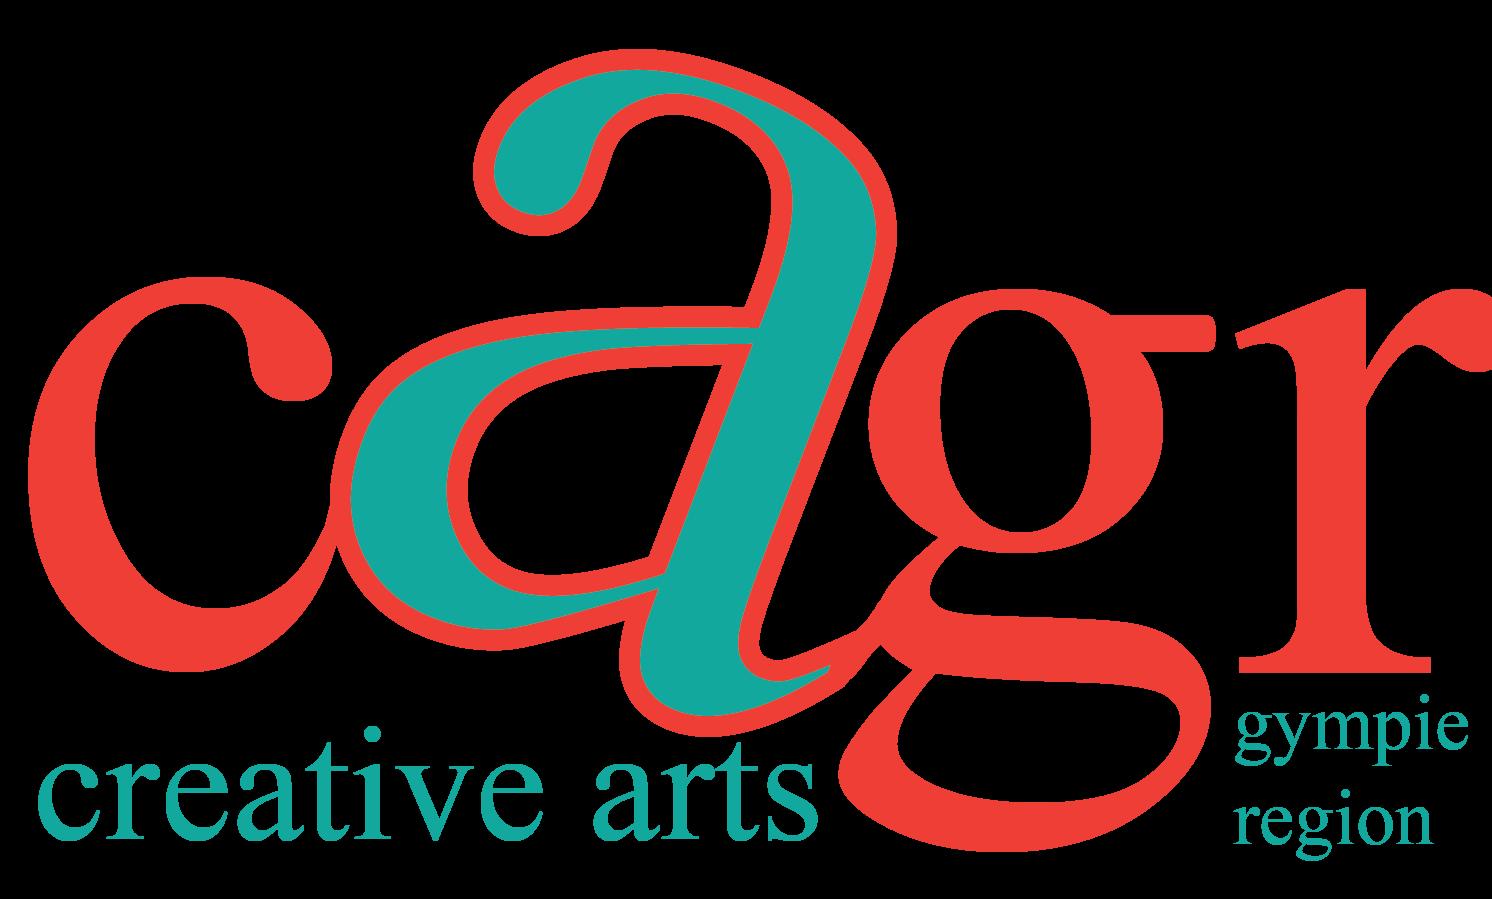 Creative Arts Gympie Region